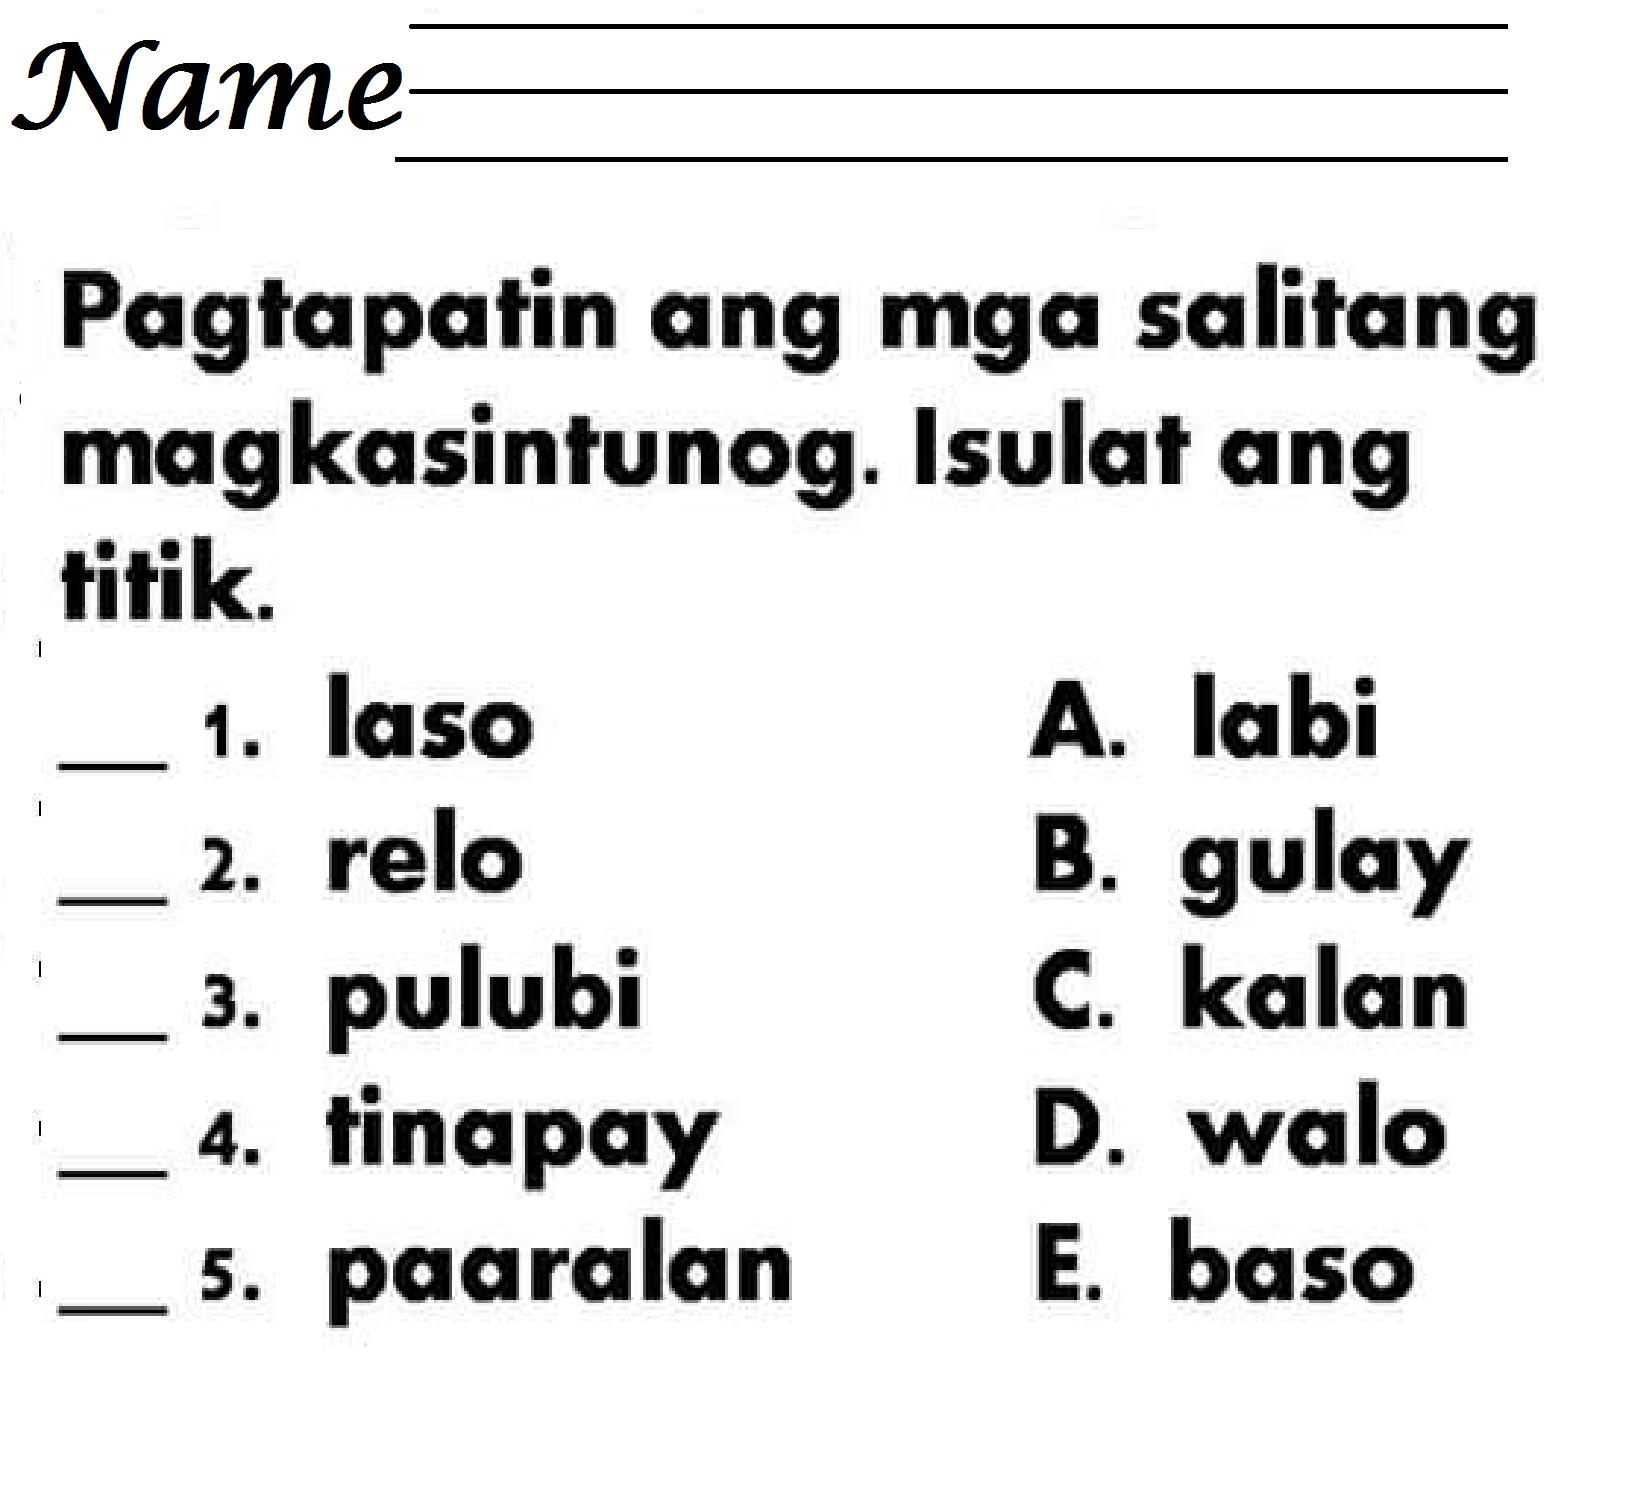 hight resolution of 12 Mother Tongue Basic (Tagalog) ideas   tagalog